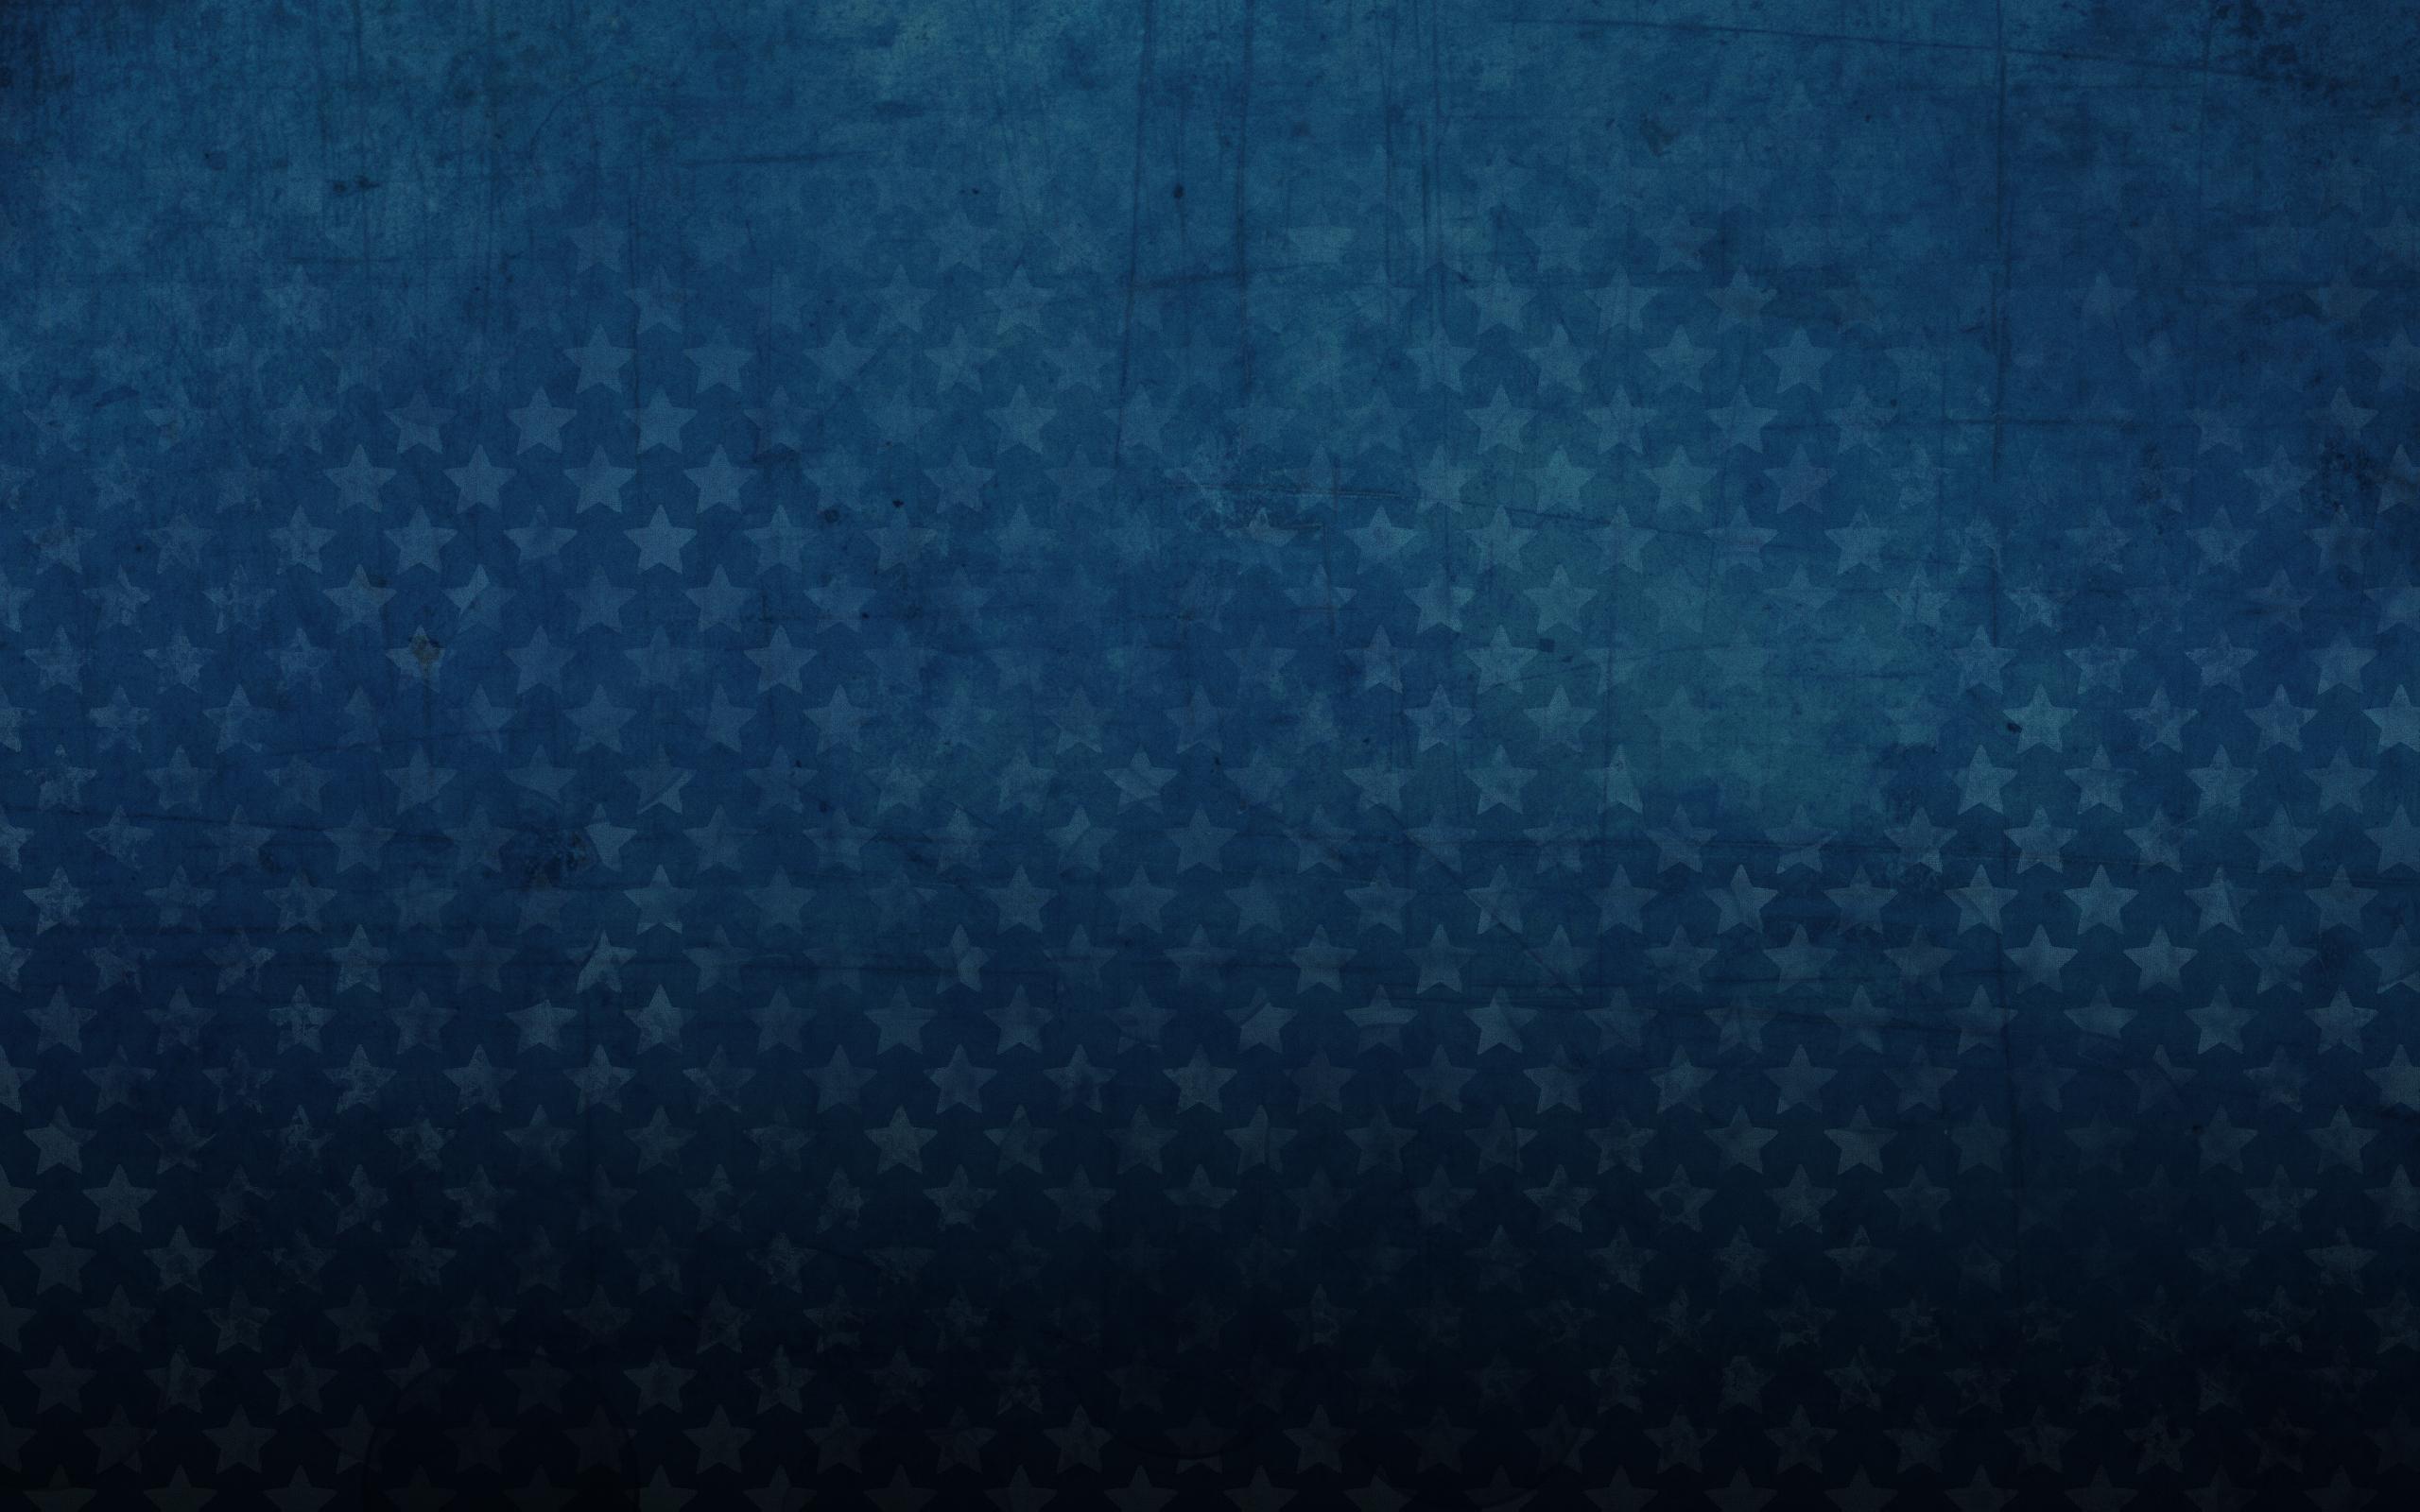 stars hd wallpaper background image 2560x1600 id 378843